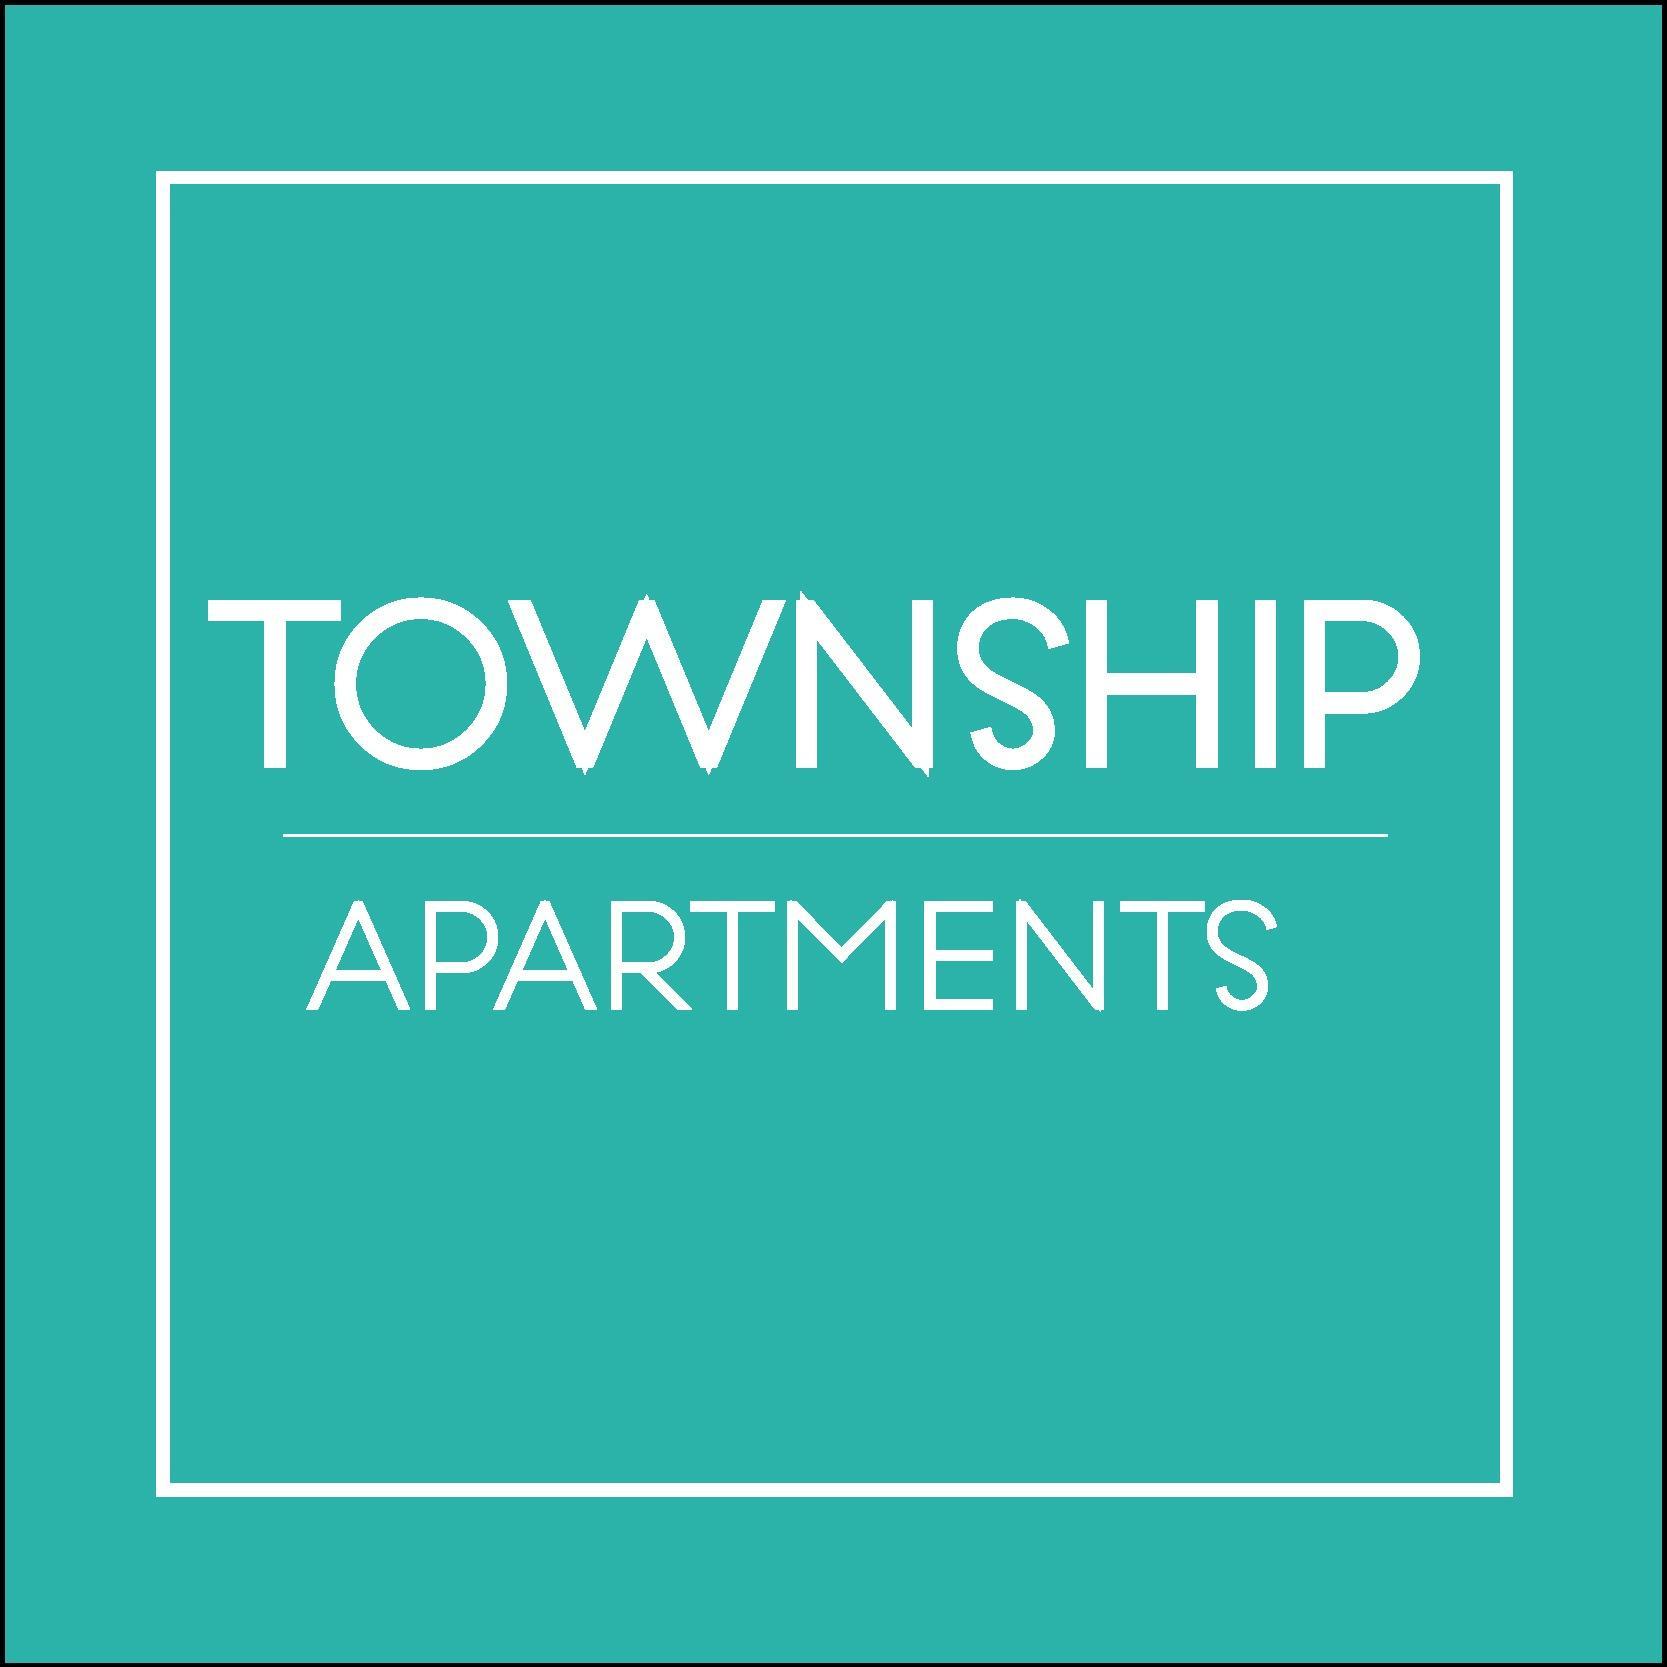 Township Apartments